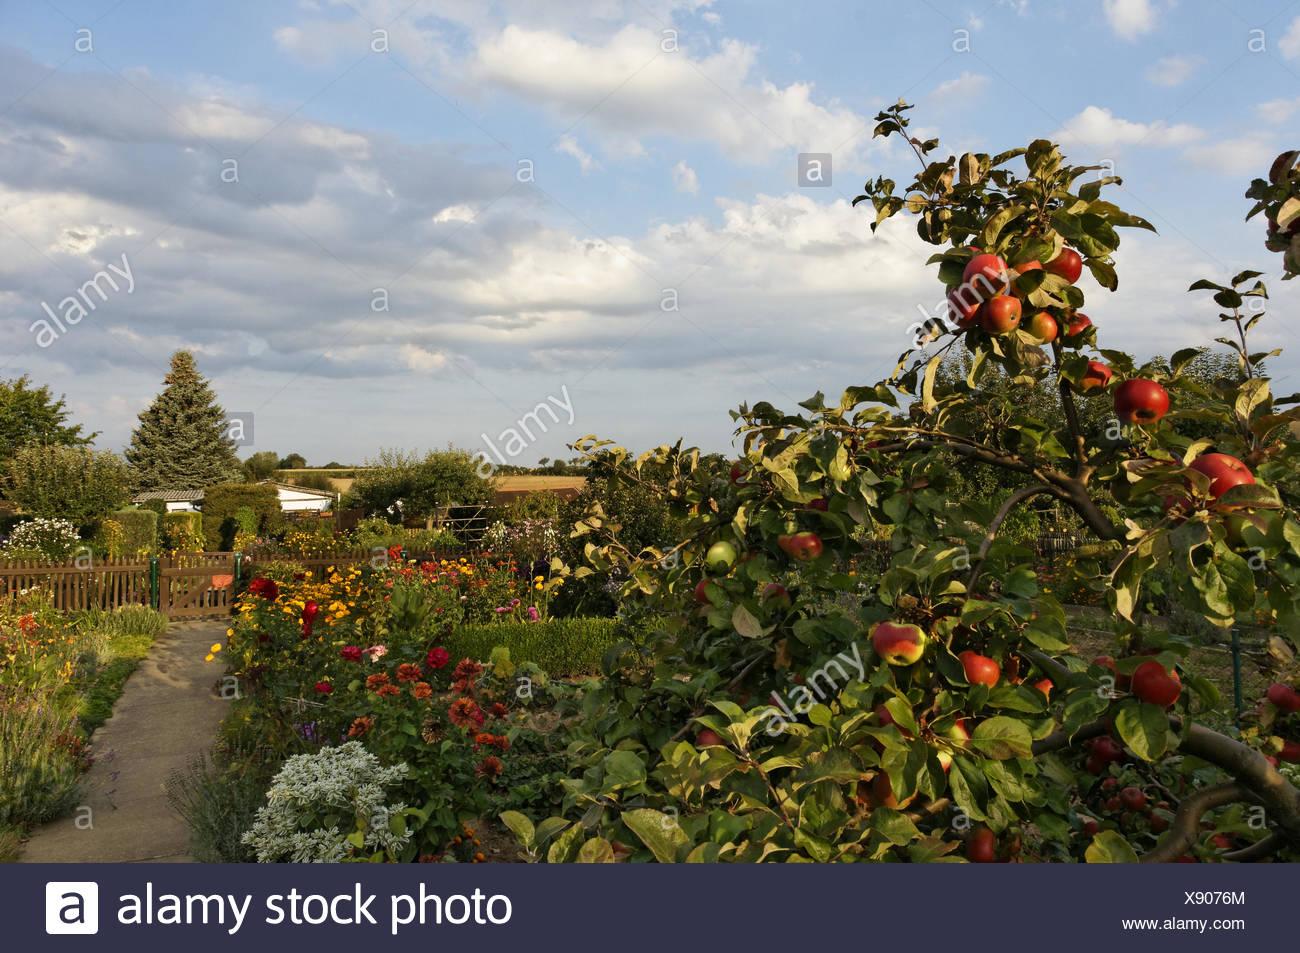 summery garden impressions - Stock Image